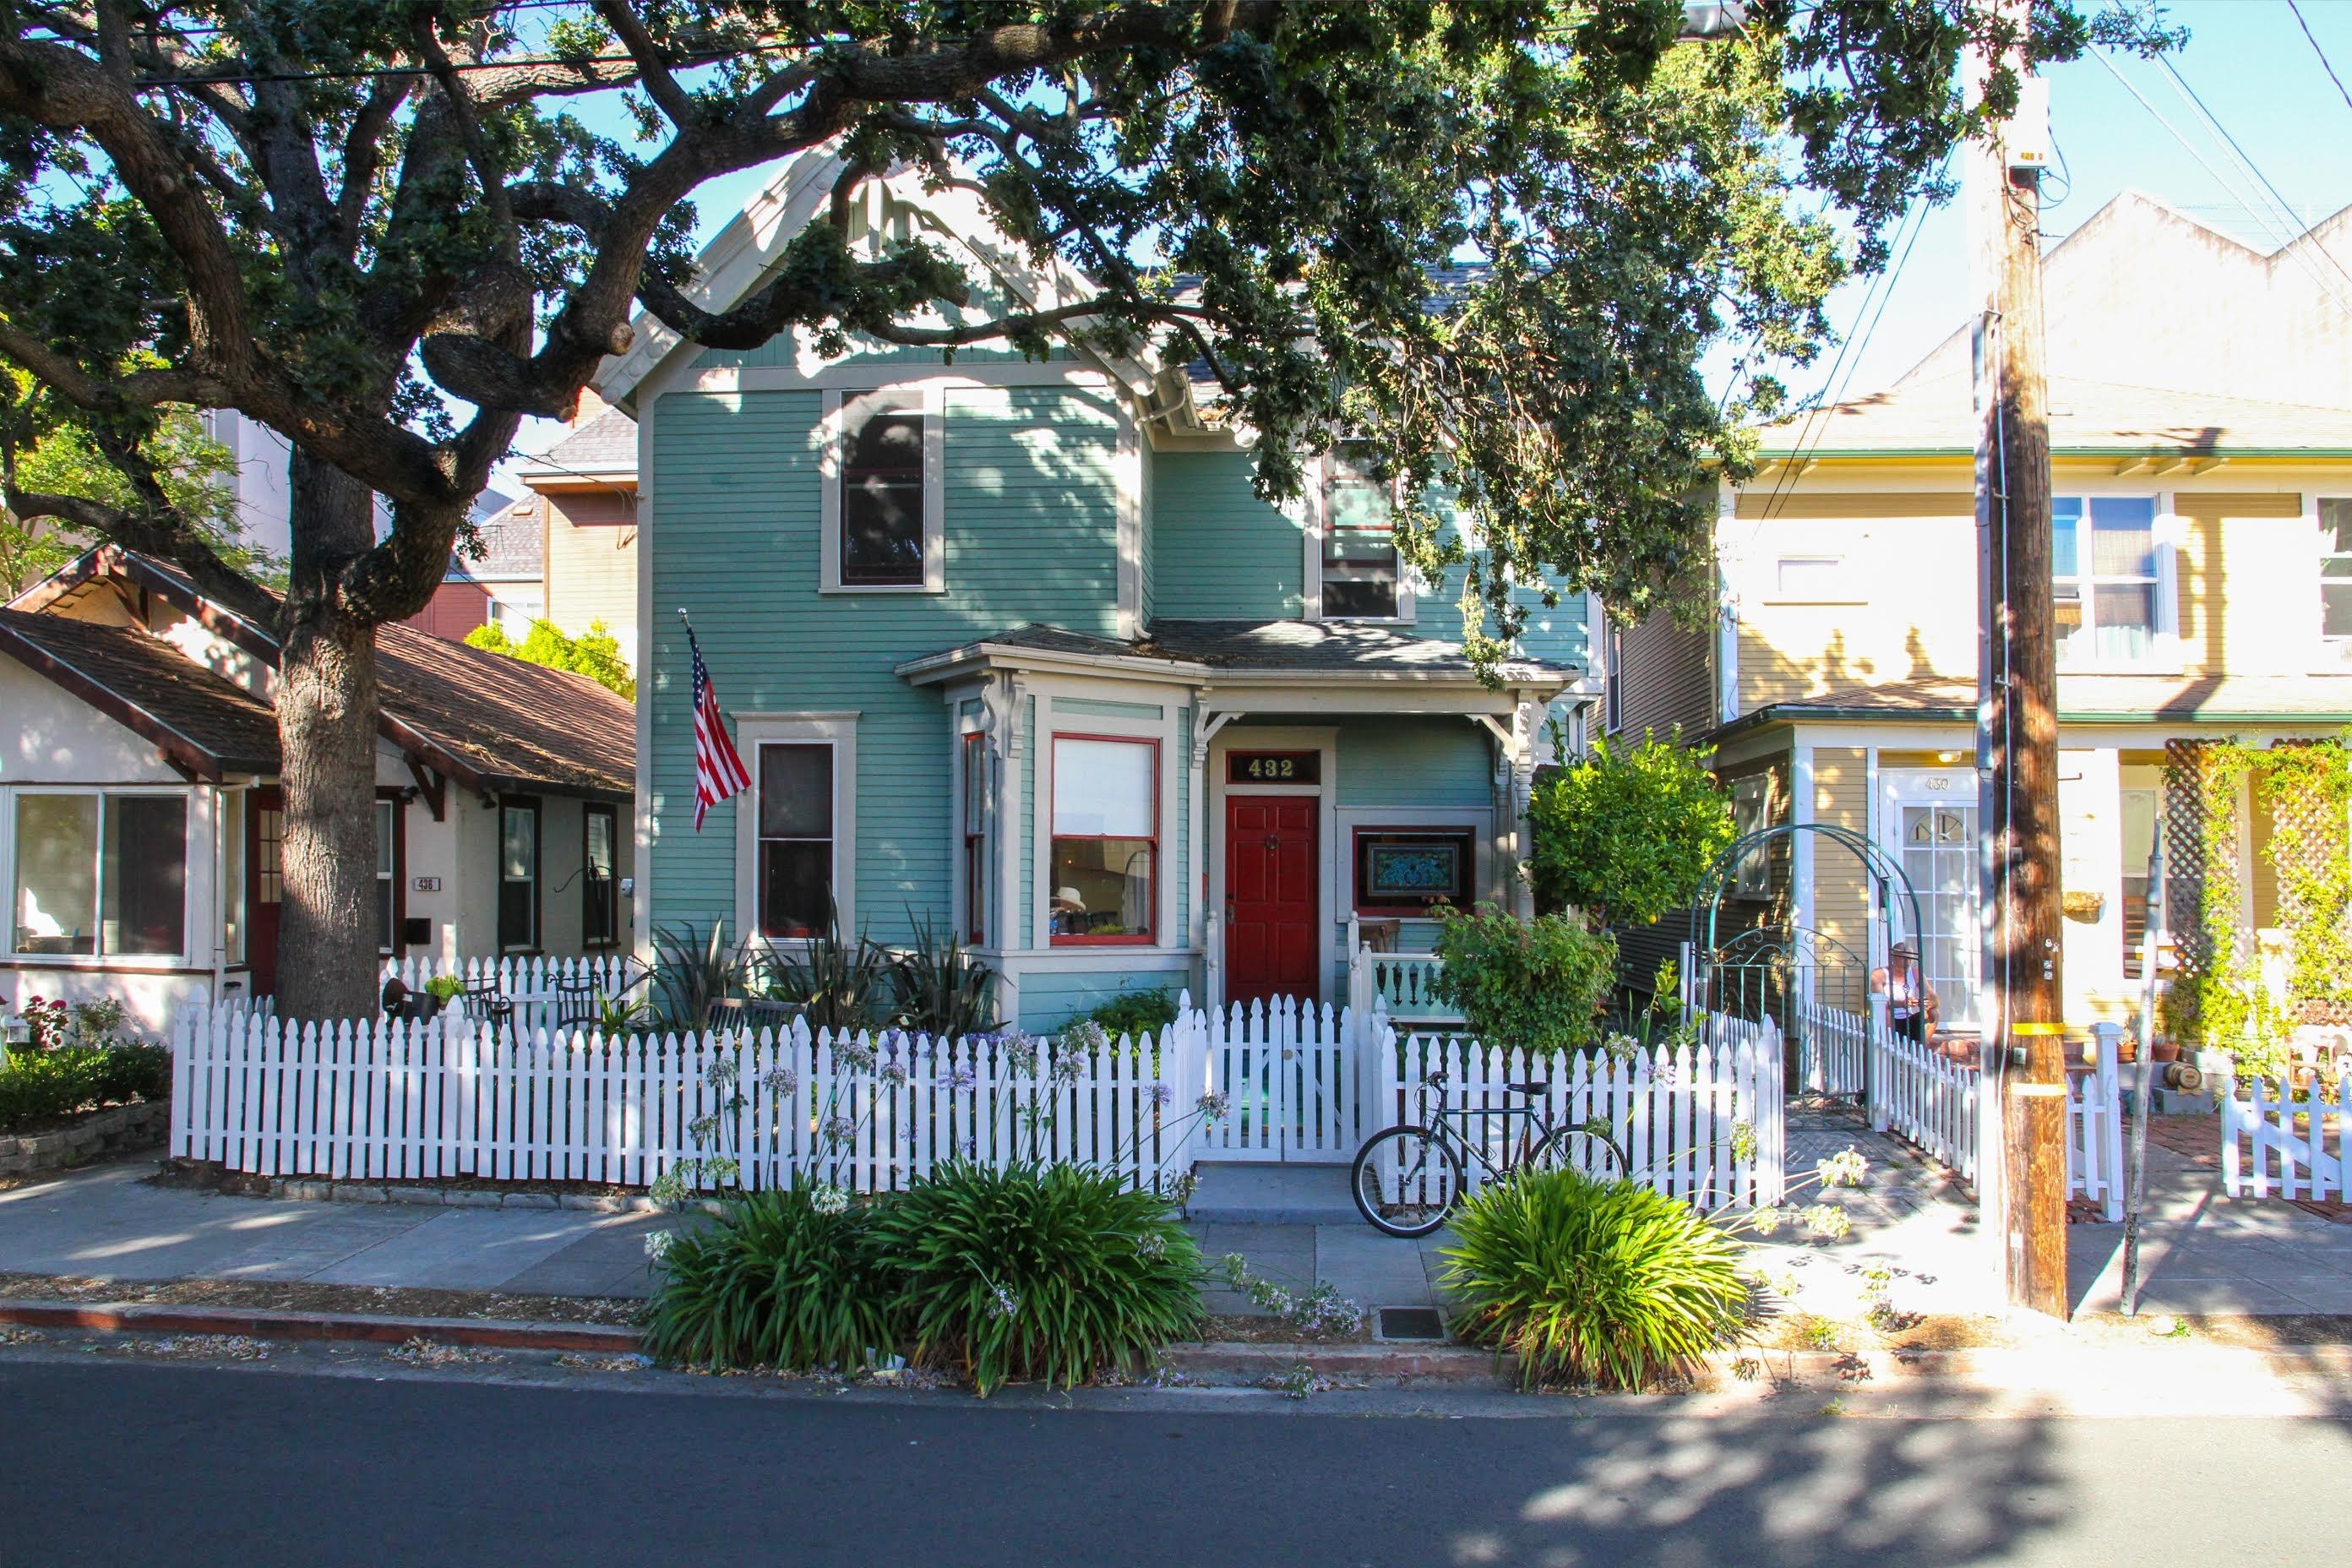 Casa Bello in Santa Rosa, California